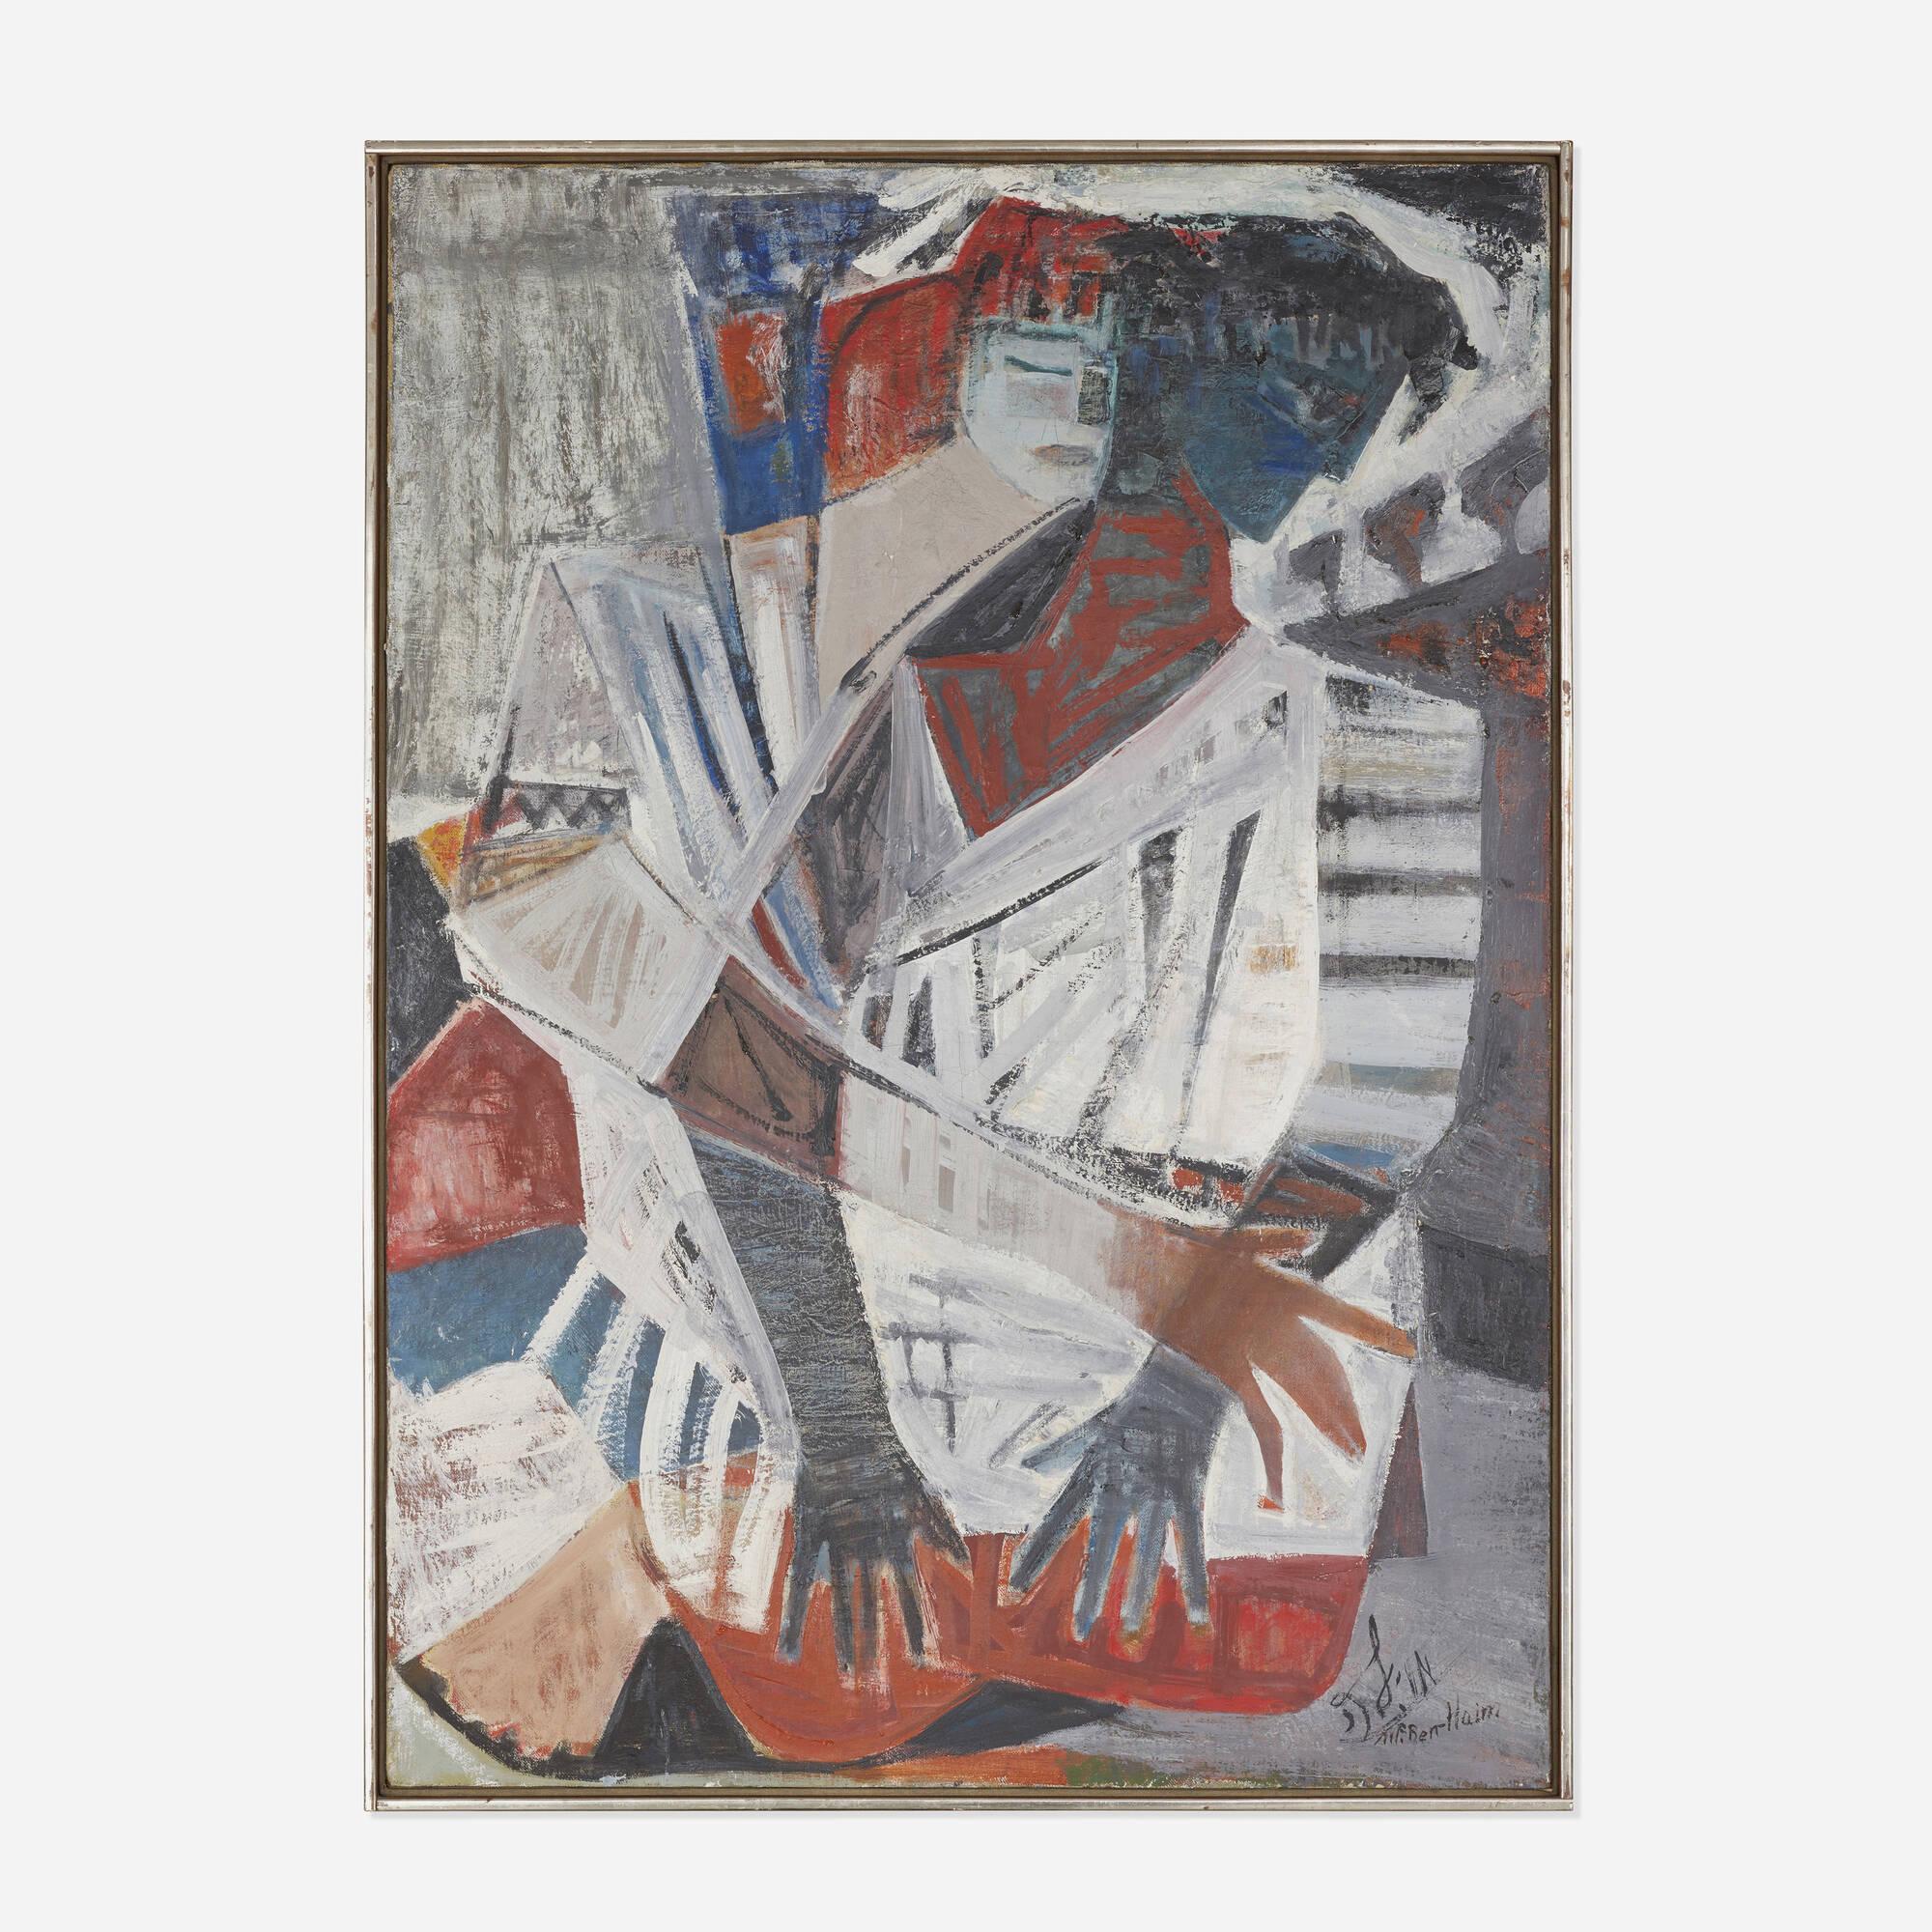 163: Mula Ben-Haim / Untitled (1 of 1)